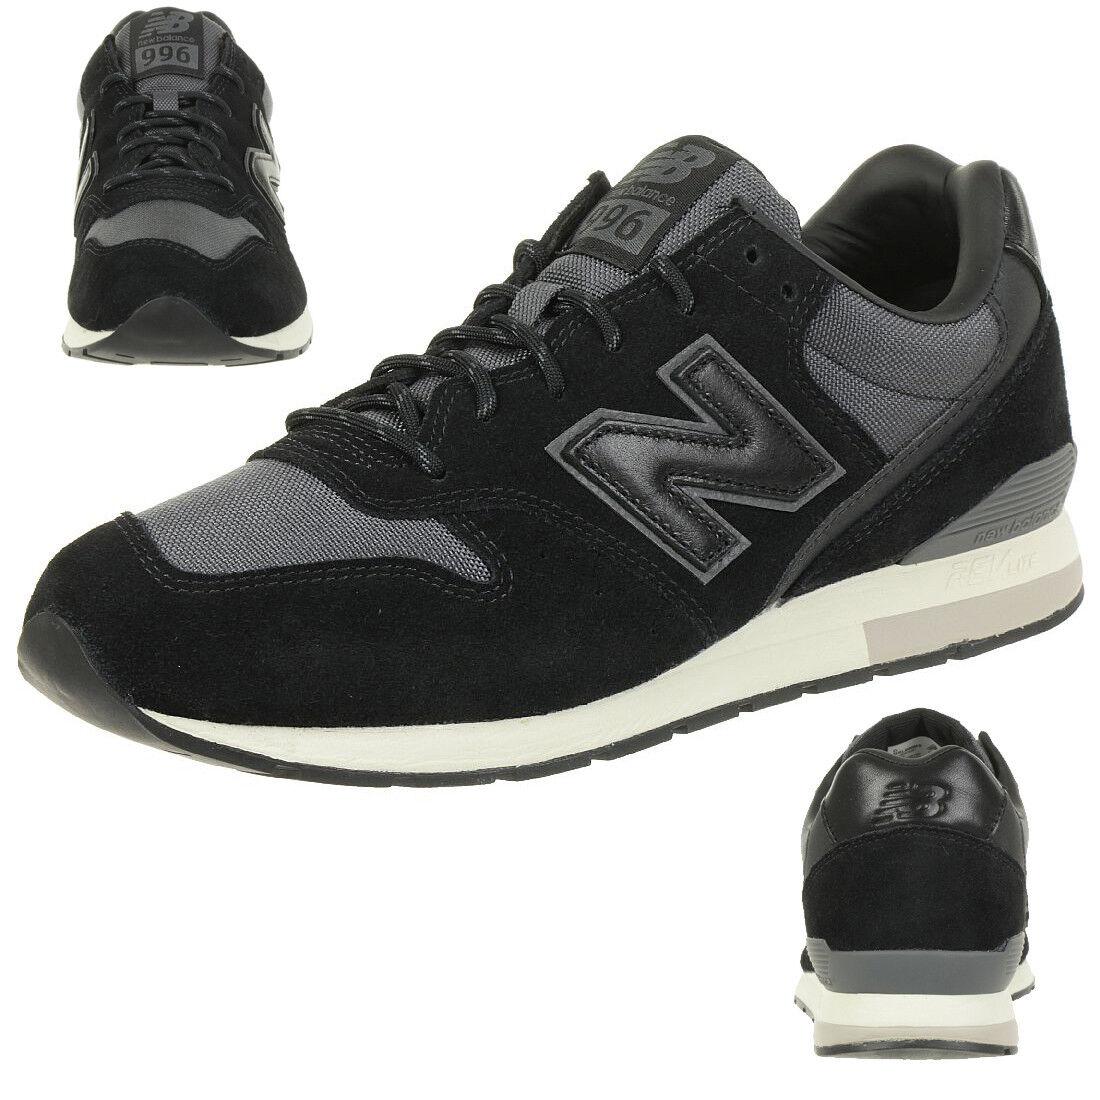 New Balance MRL996MS Classic Sneaker Herren Schuhe schwarz 996